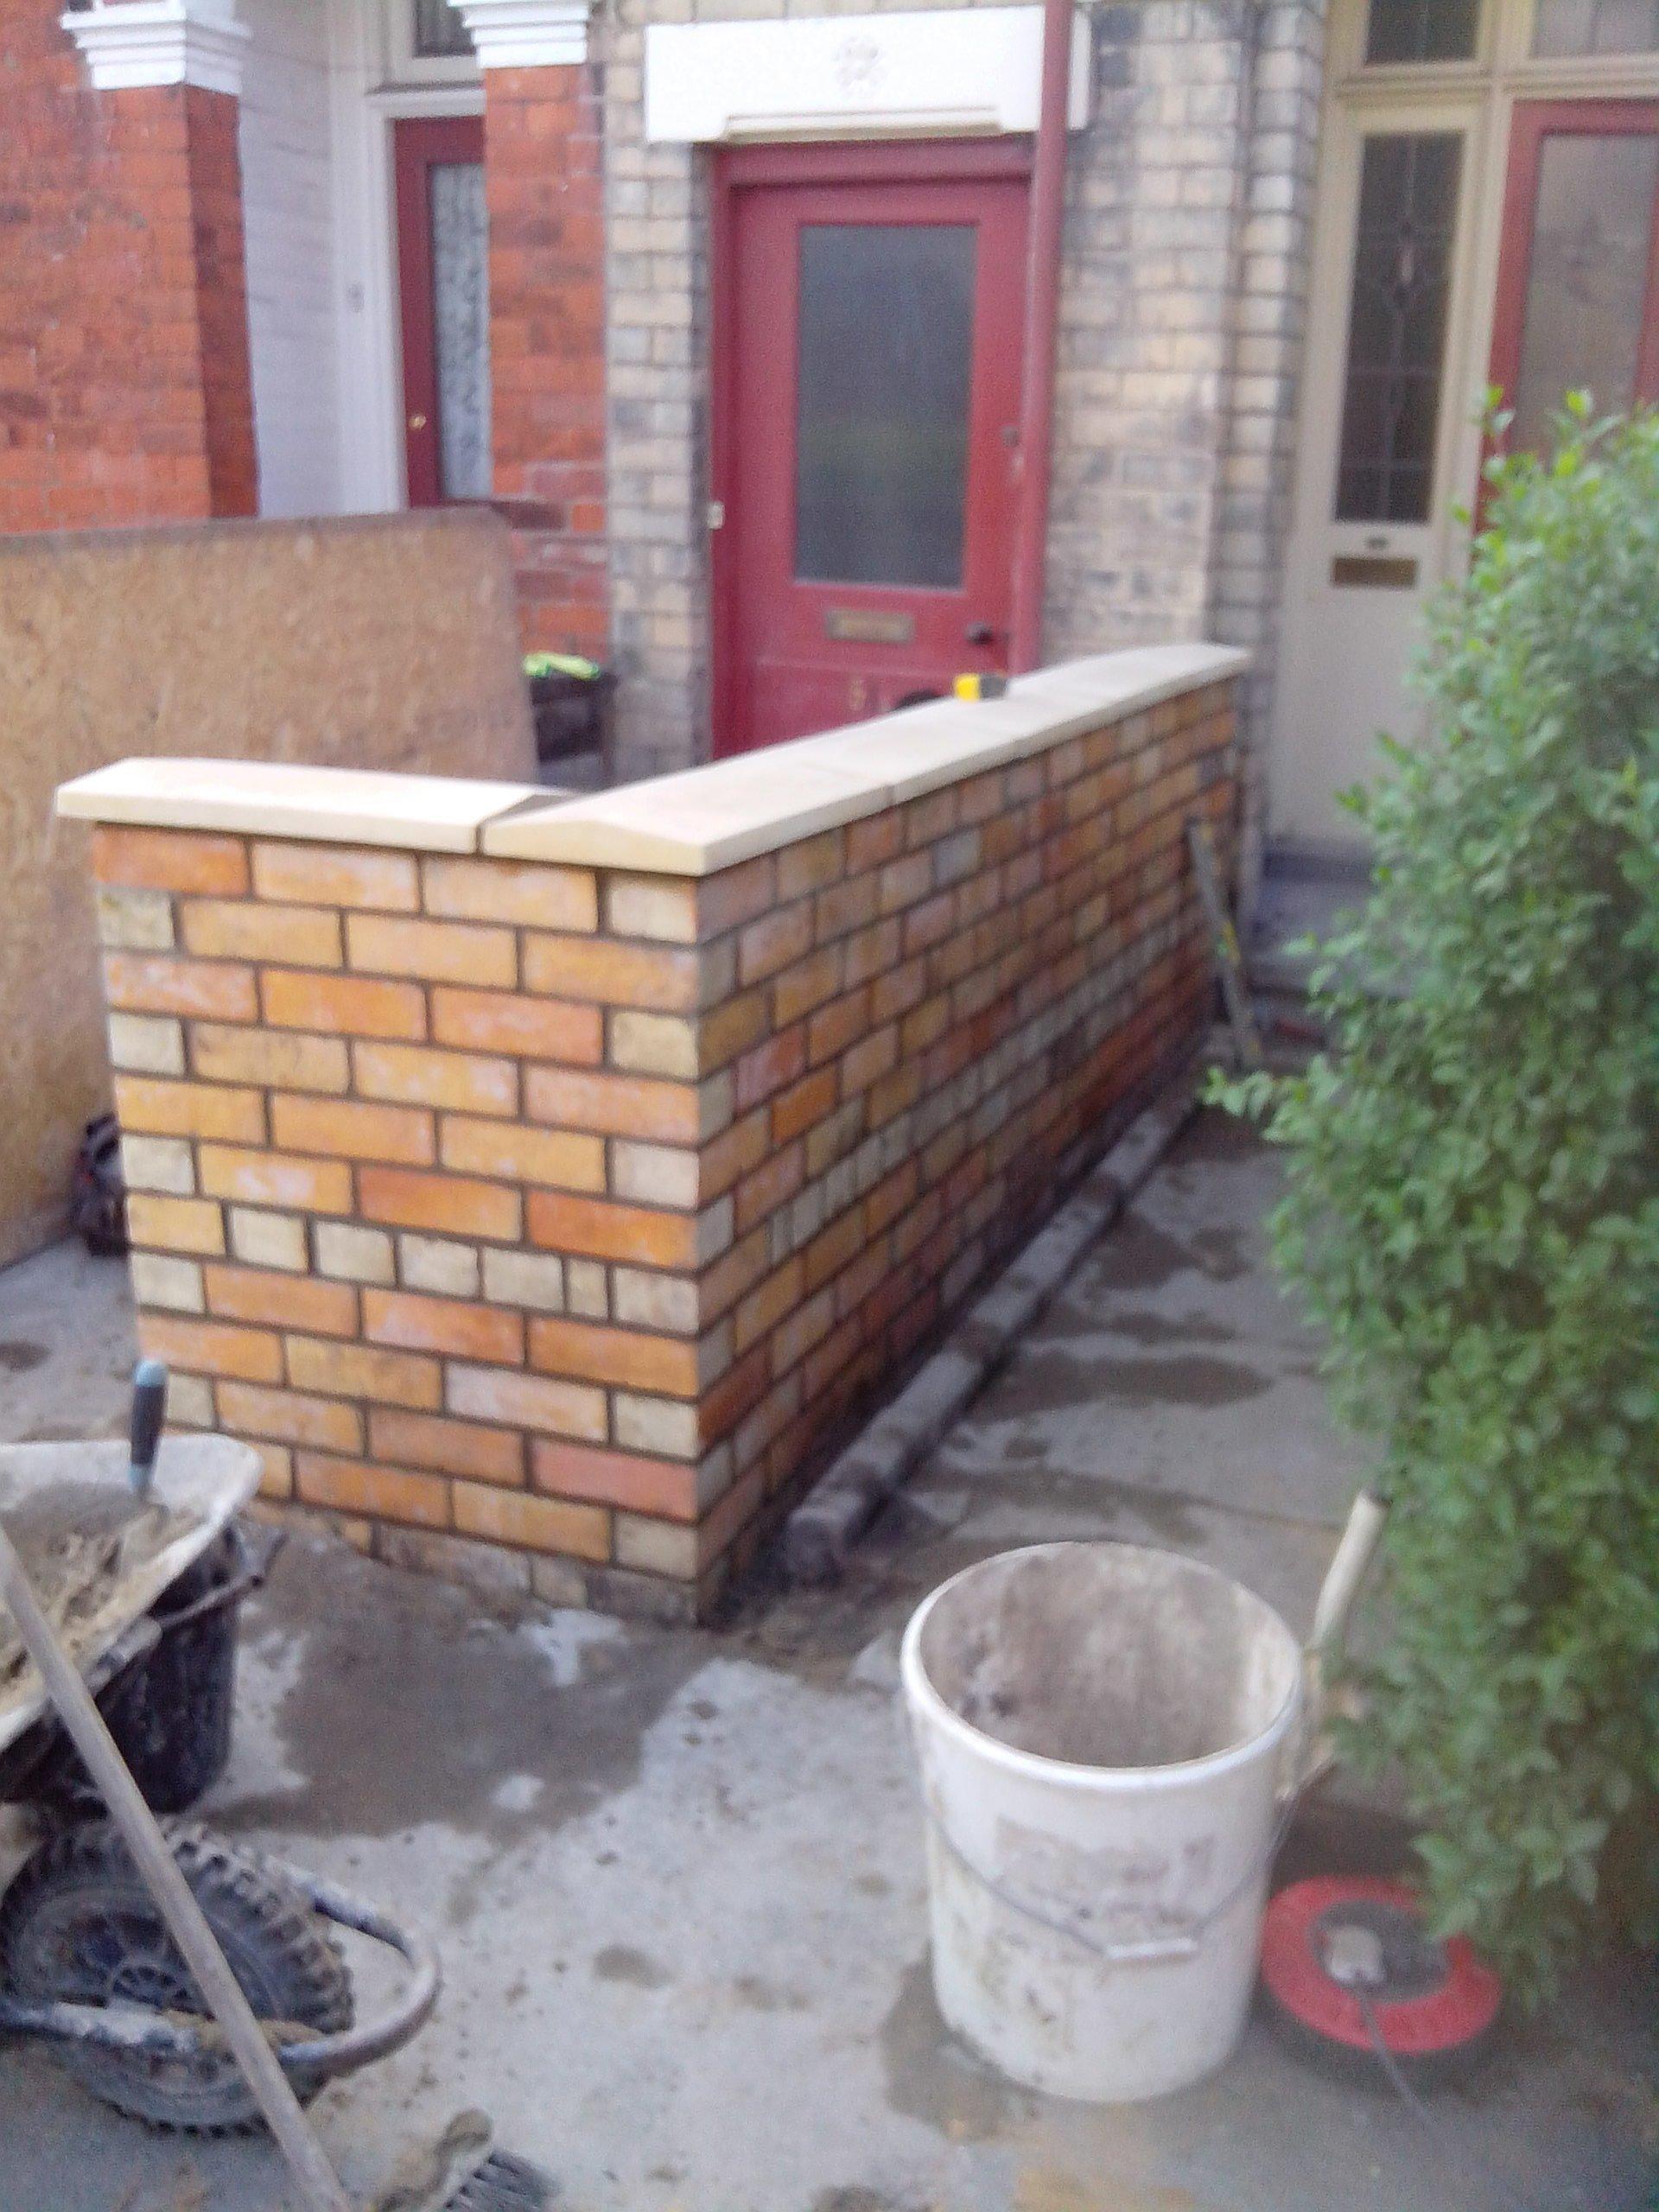 Brick wall constructions